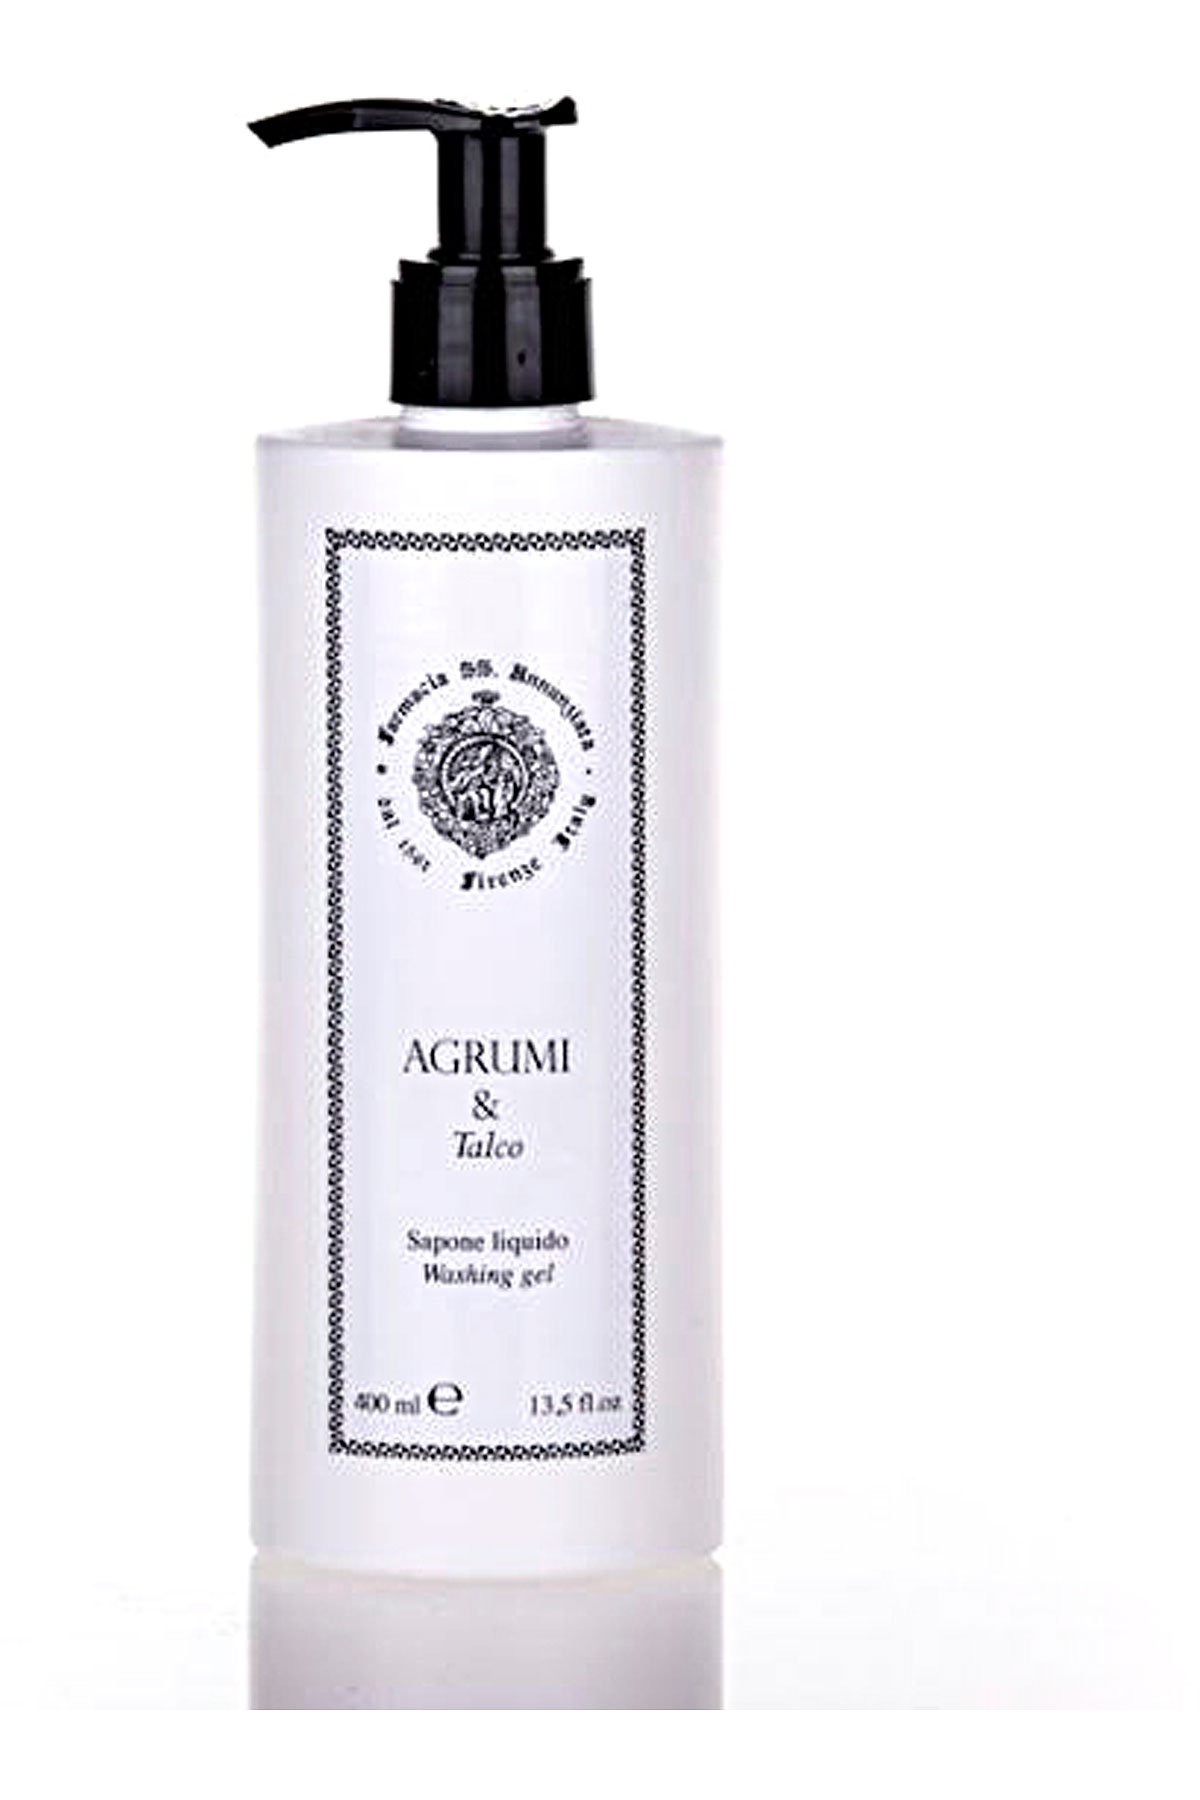 Farmacia Ss Annunziata 1561 Beauty for Women On Sale, Agrumi E Talco - Liquid Soap - 400 Ml, 2019, 400 ml